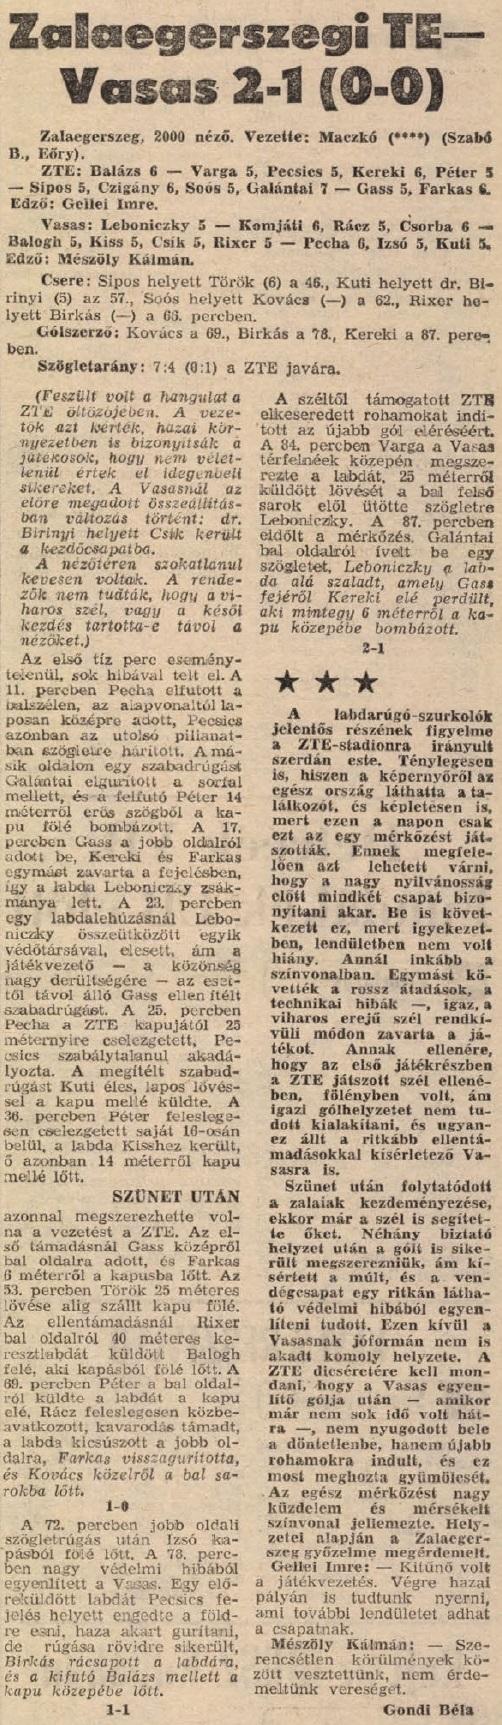 idokapszula_nb_i_1983_84_23_fordulo_zte_vasas.jpg